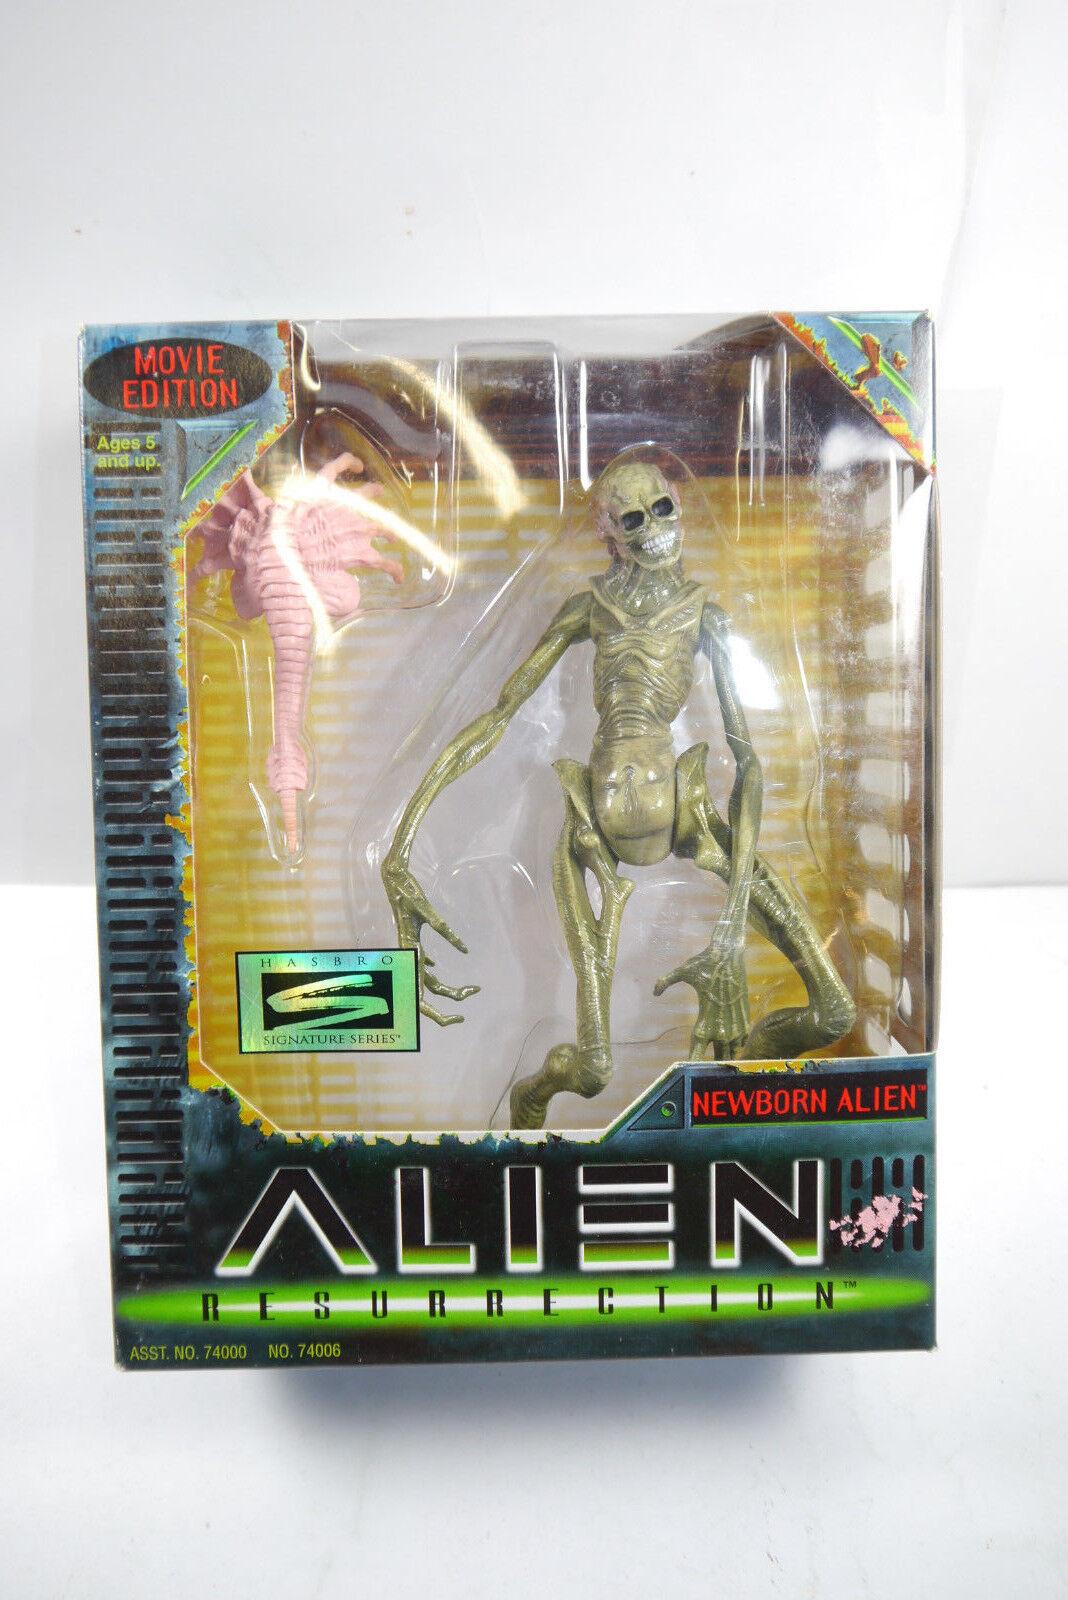 Alien Resurrection Newborn Alien Action Figure Kenner Approx. 18 cm cm cm New (L) d28f2b